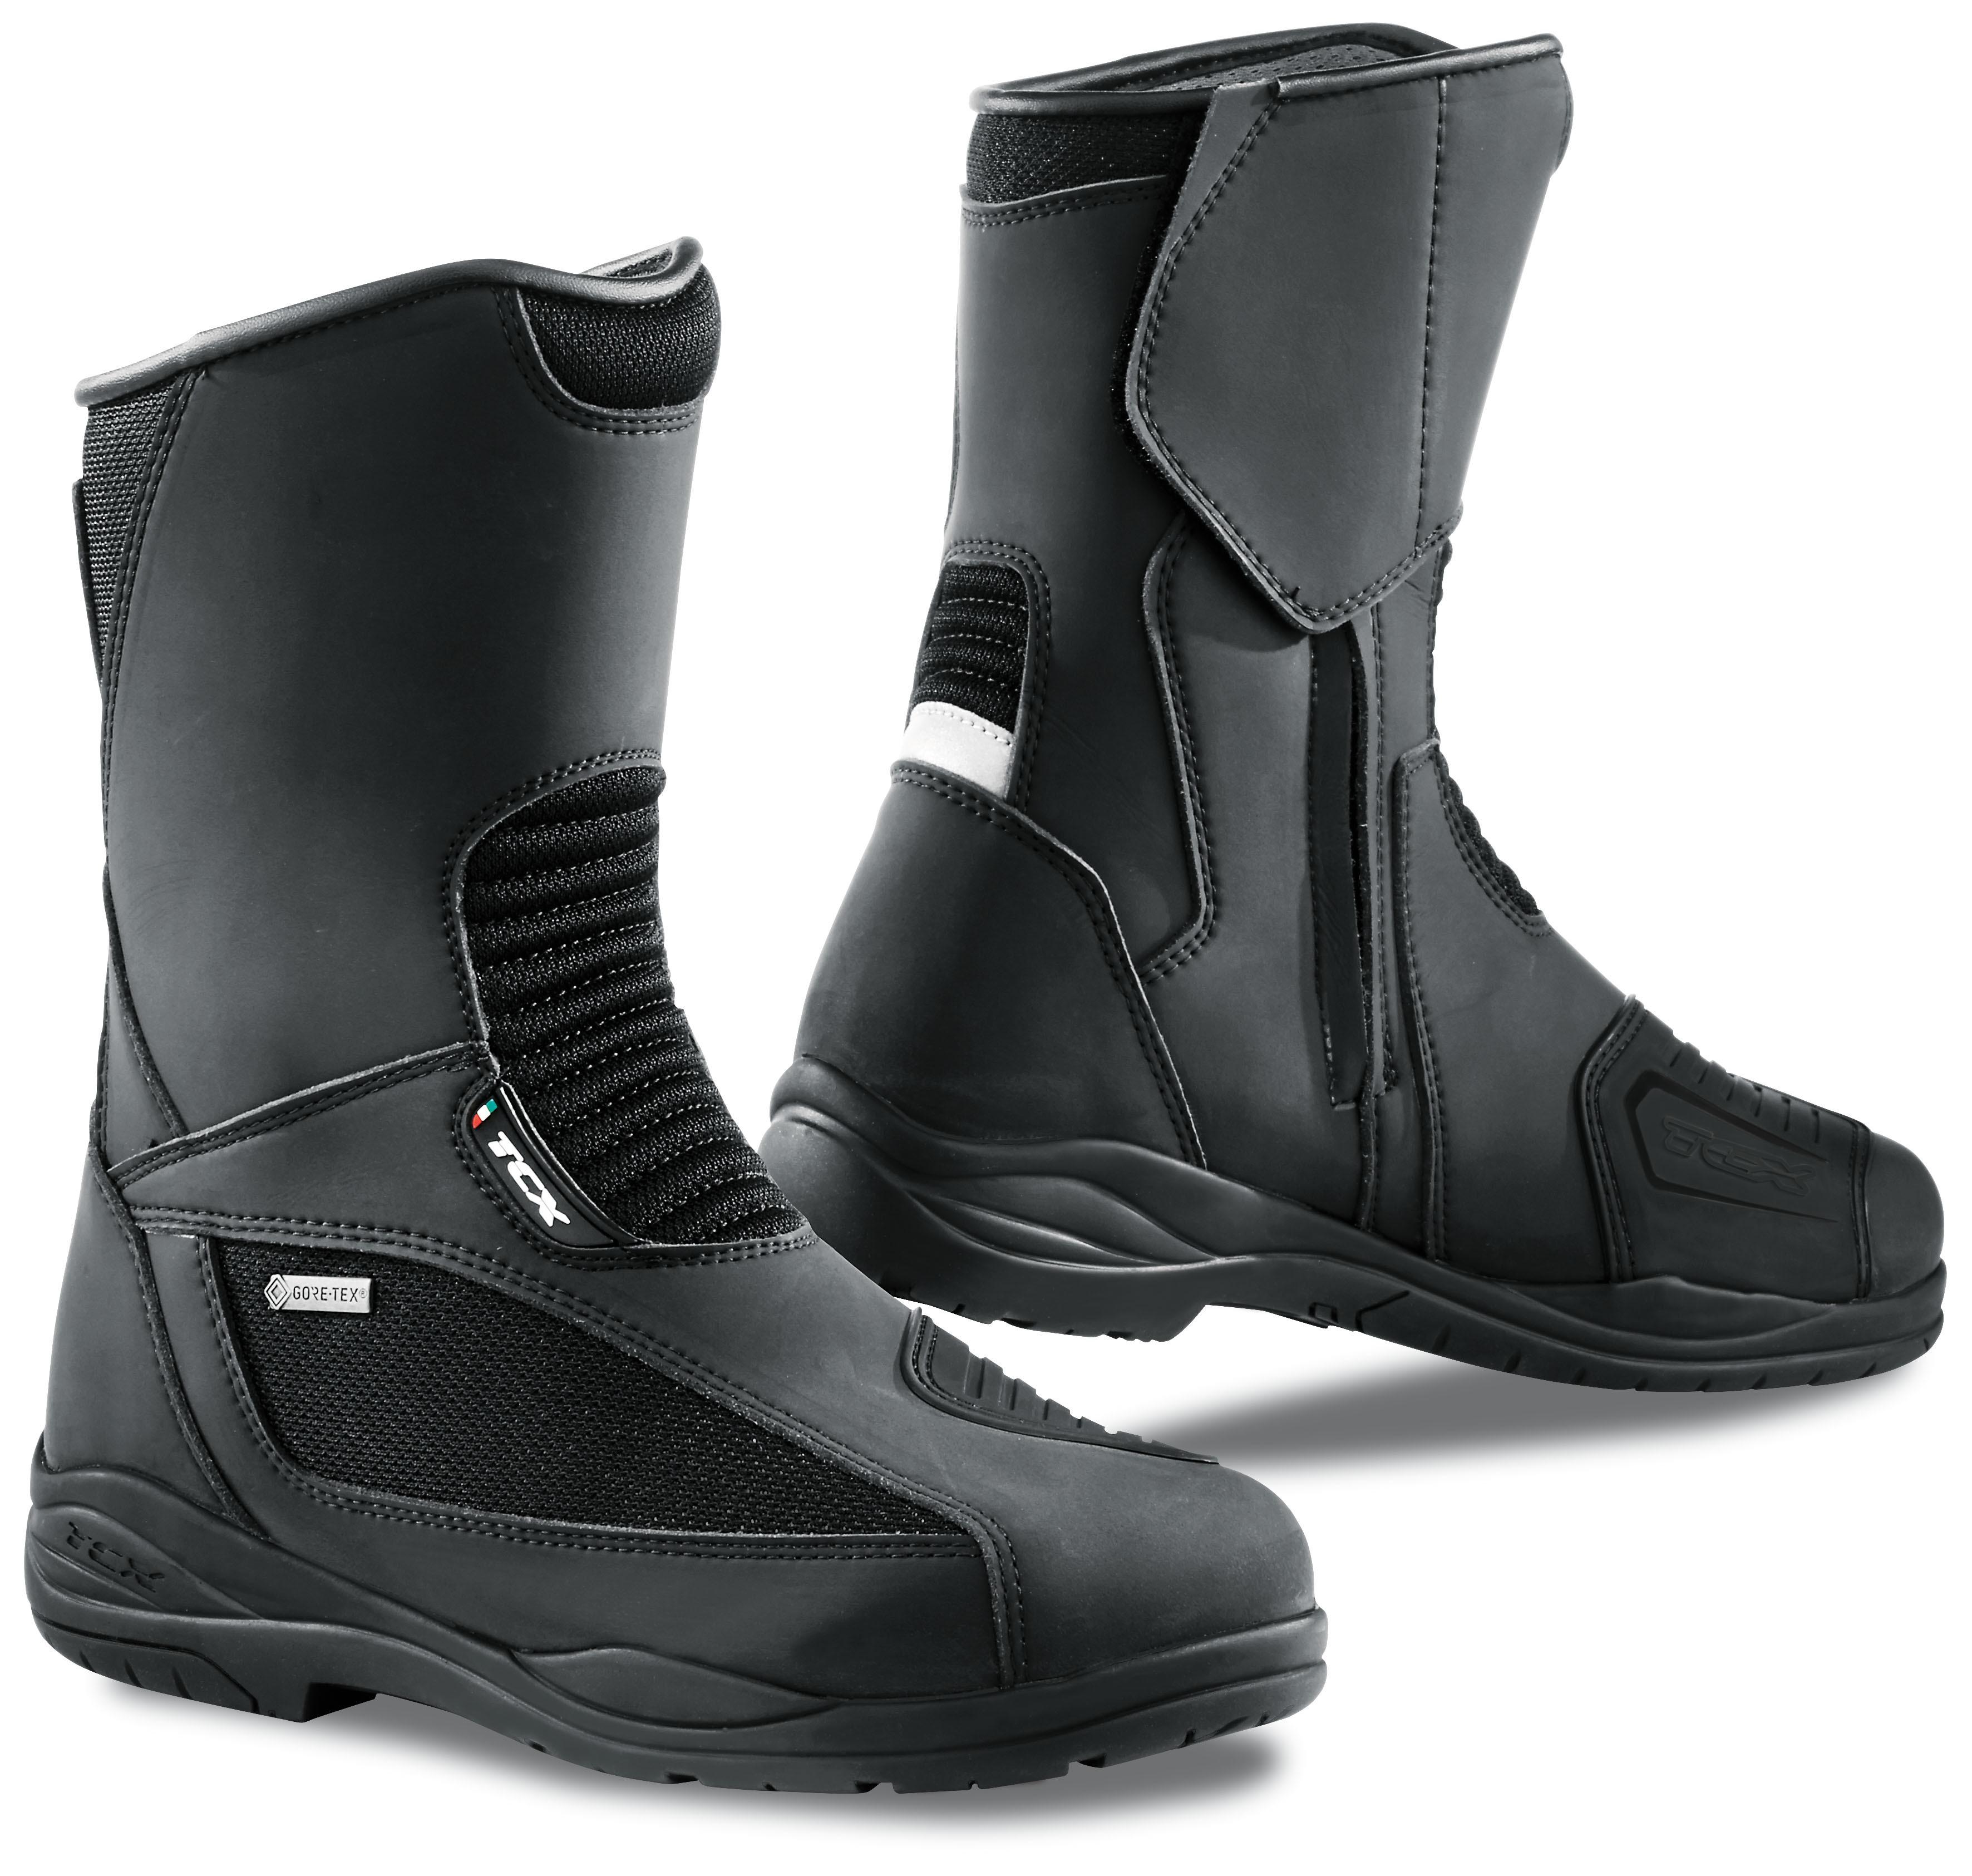 TCX Explorer Evo GTX Lady Boots